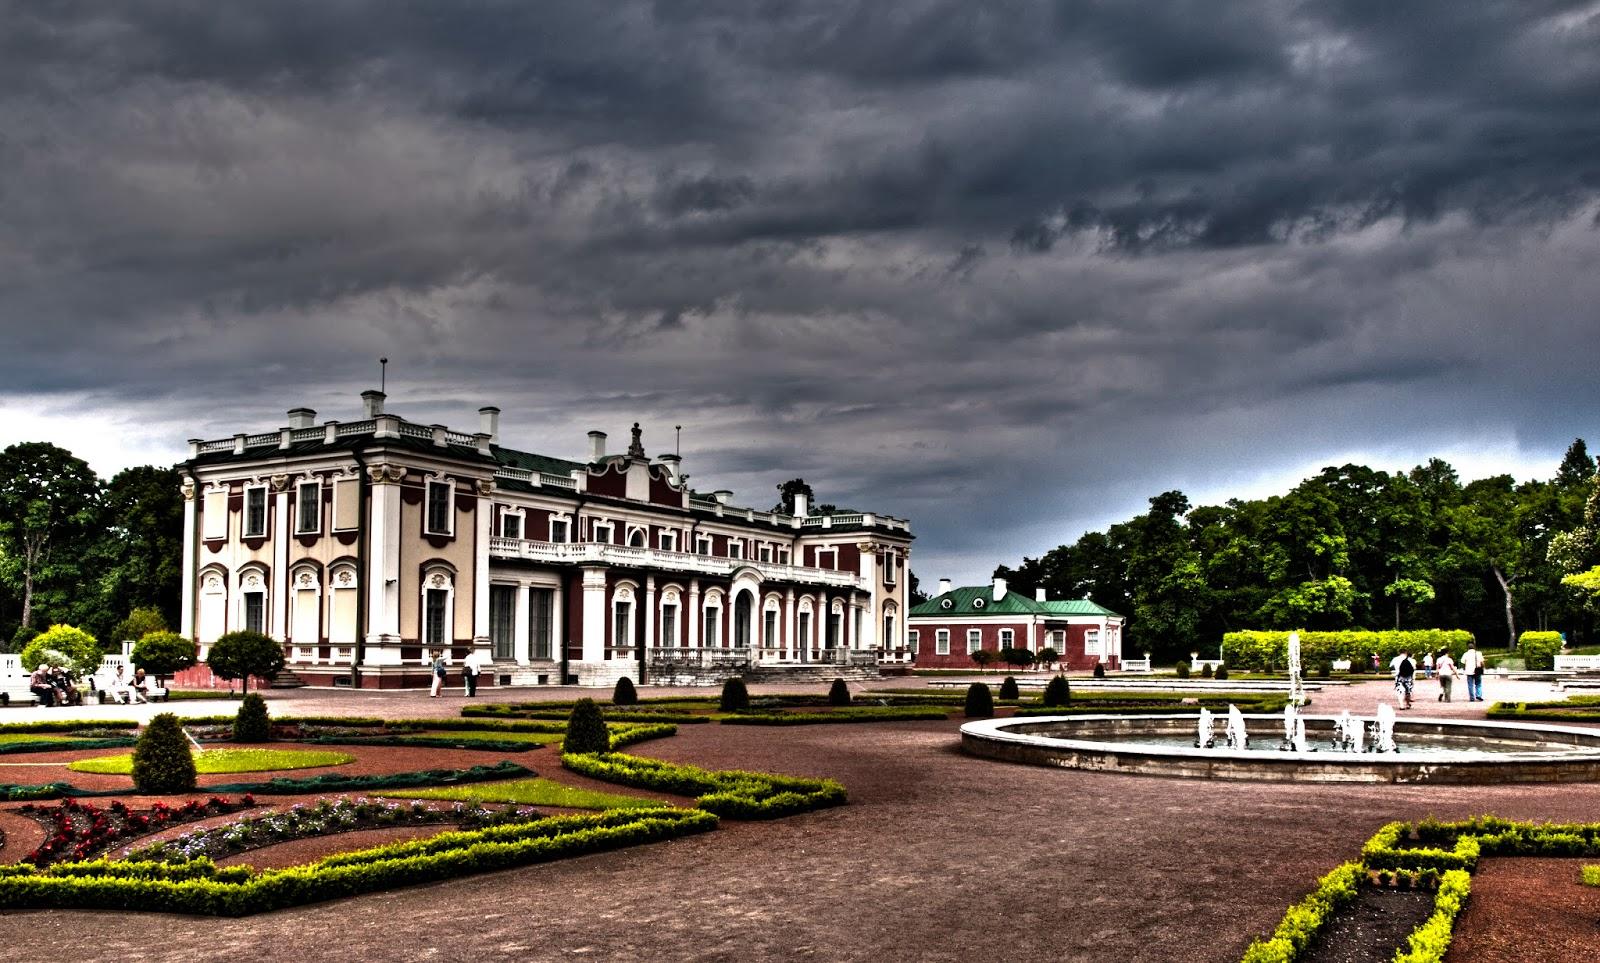 Дворец и парк Кадриорг в Таллинне